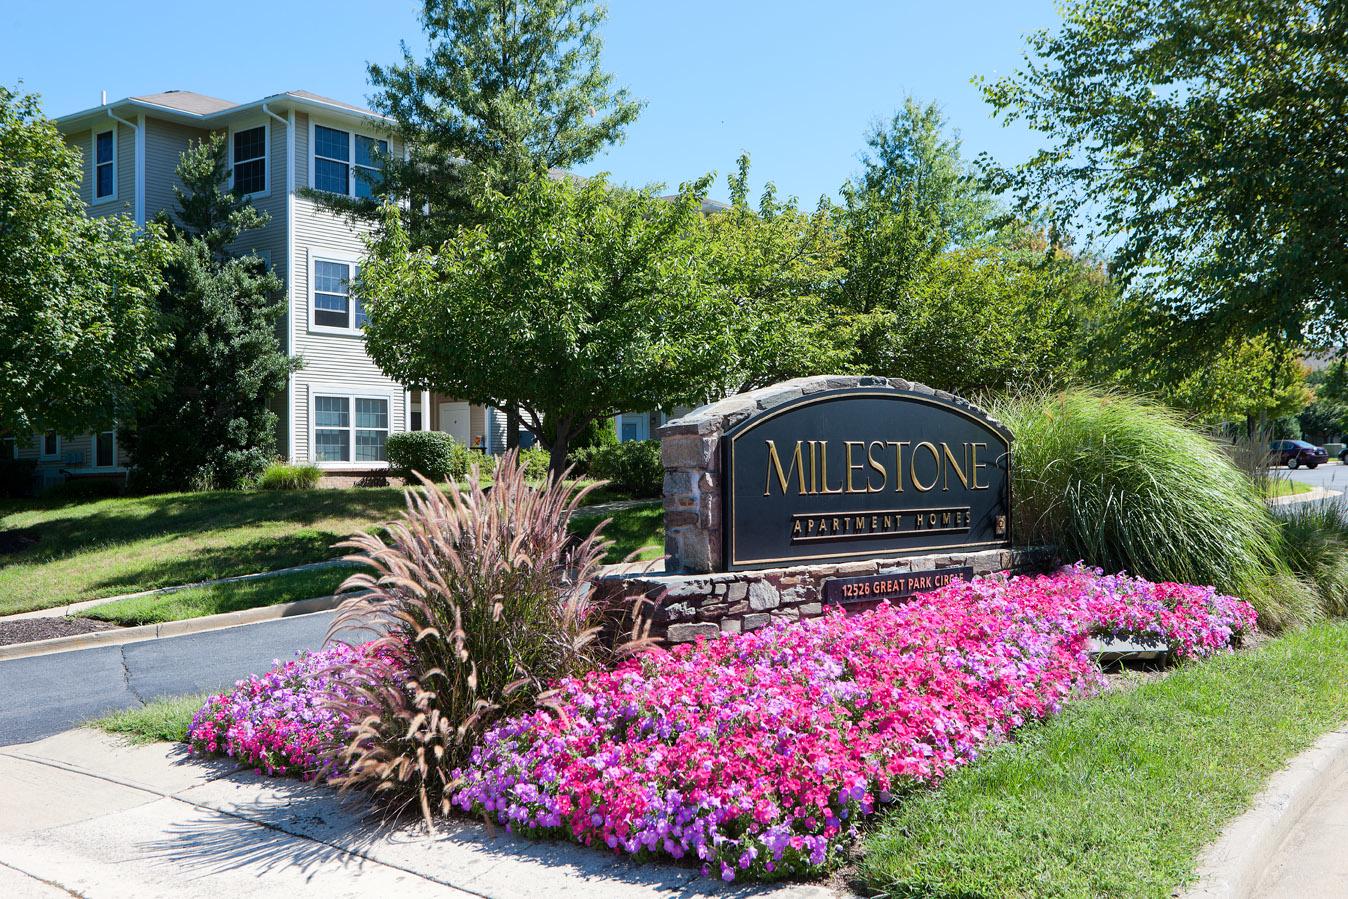 Milestone Apartment Homes image 1